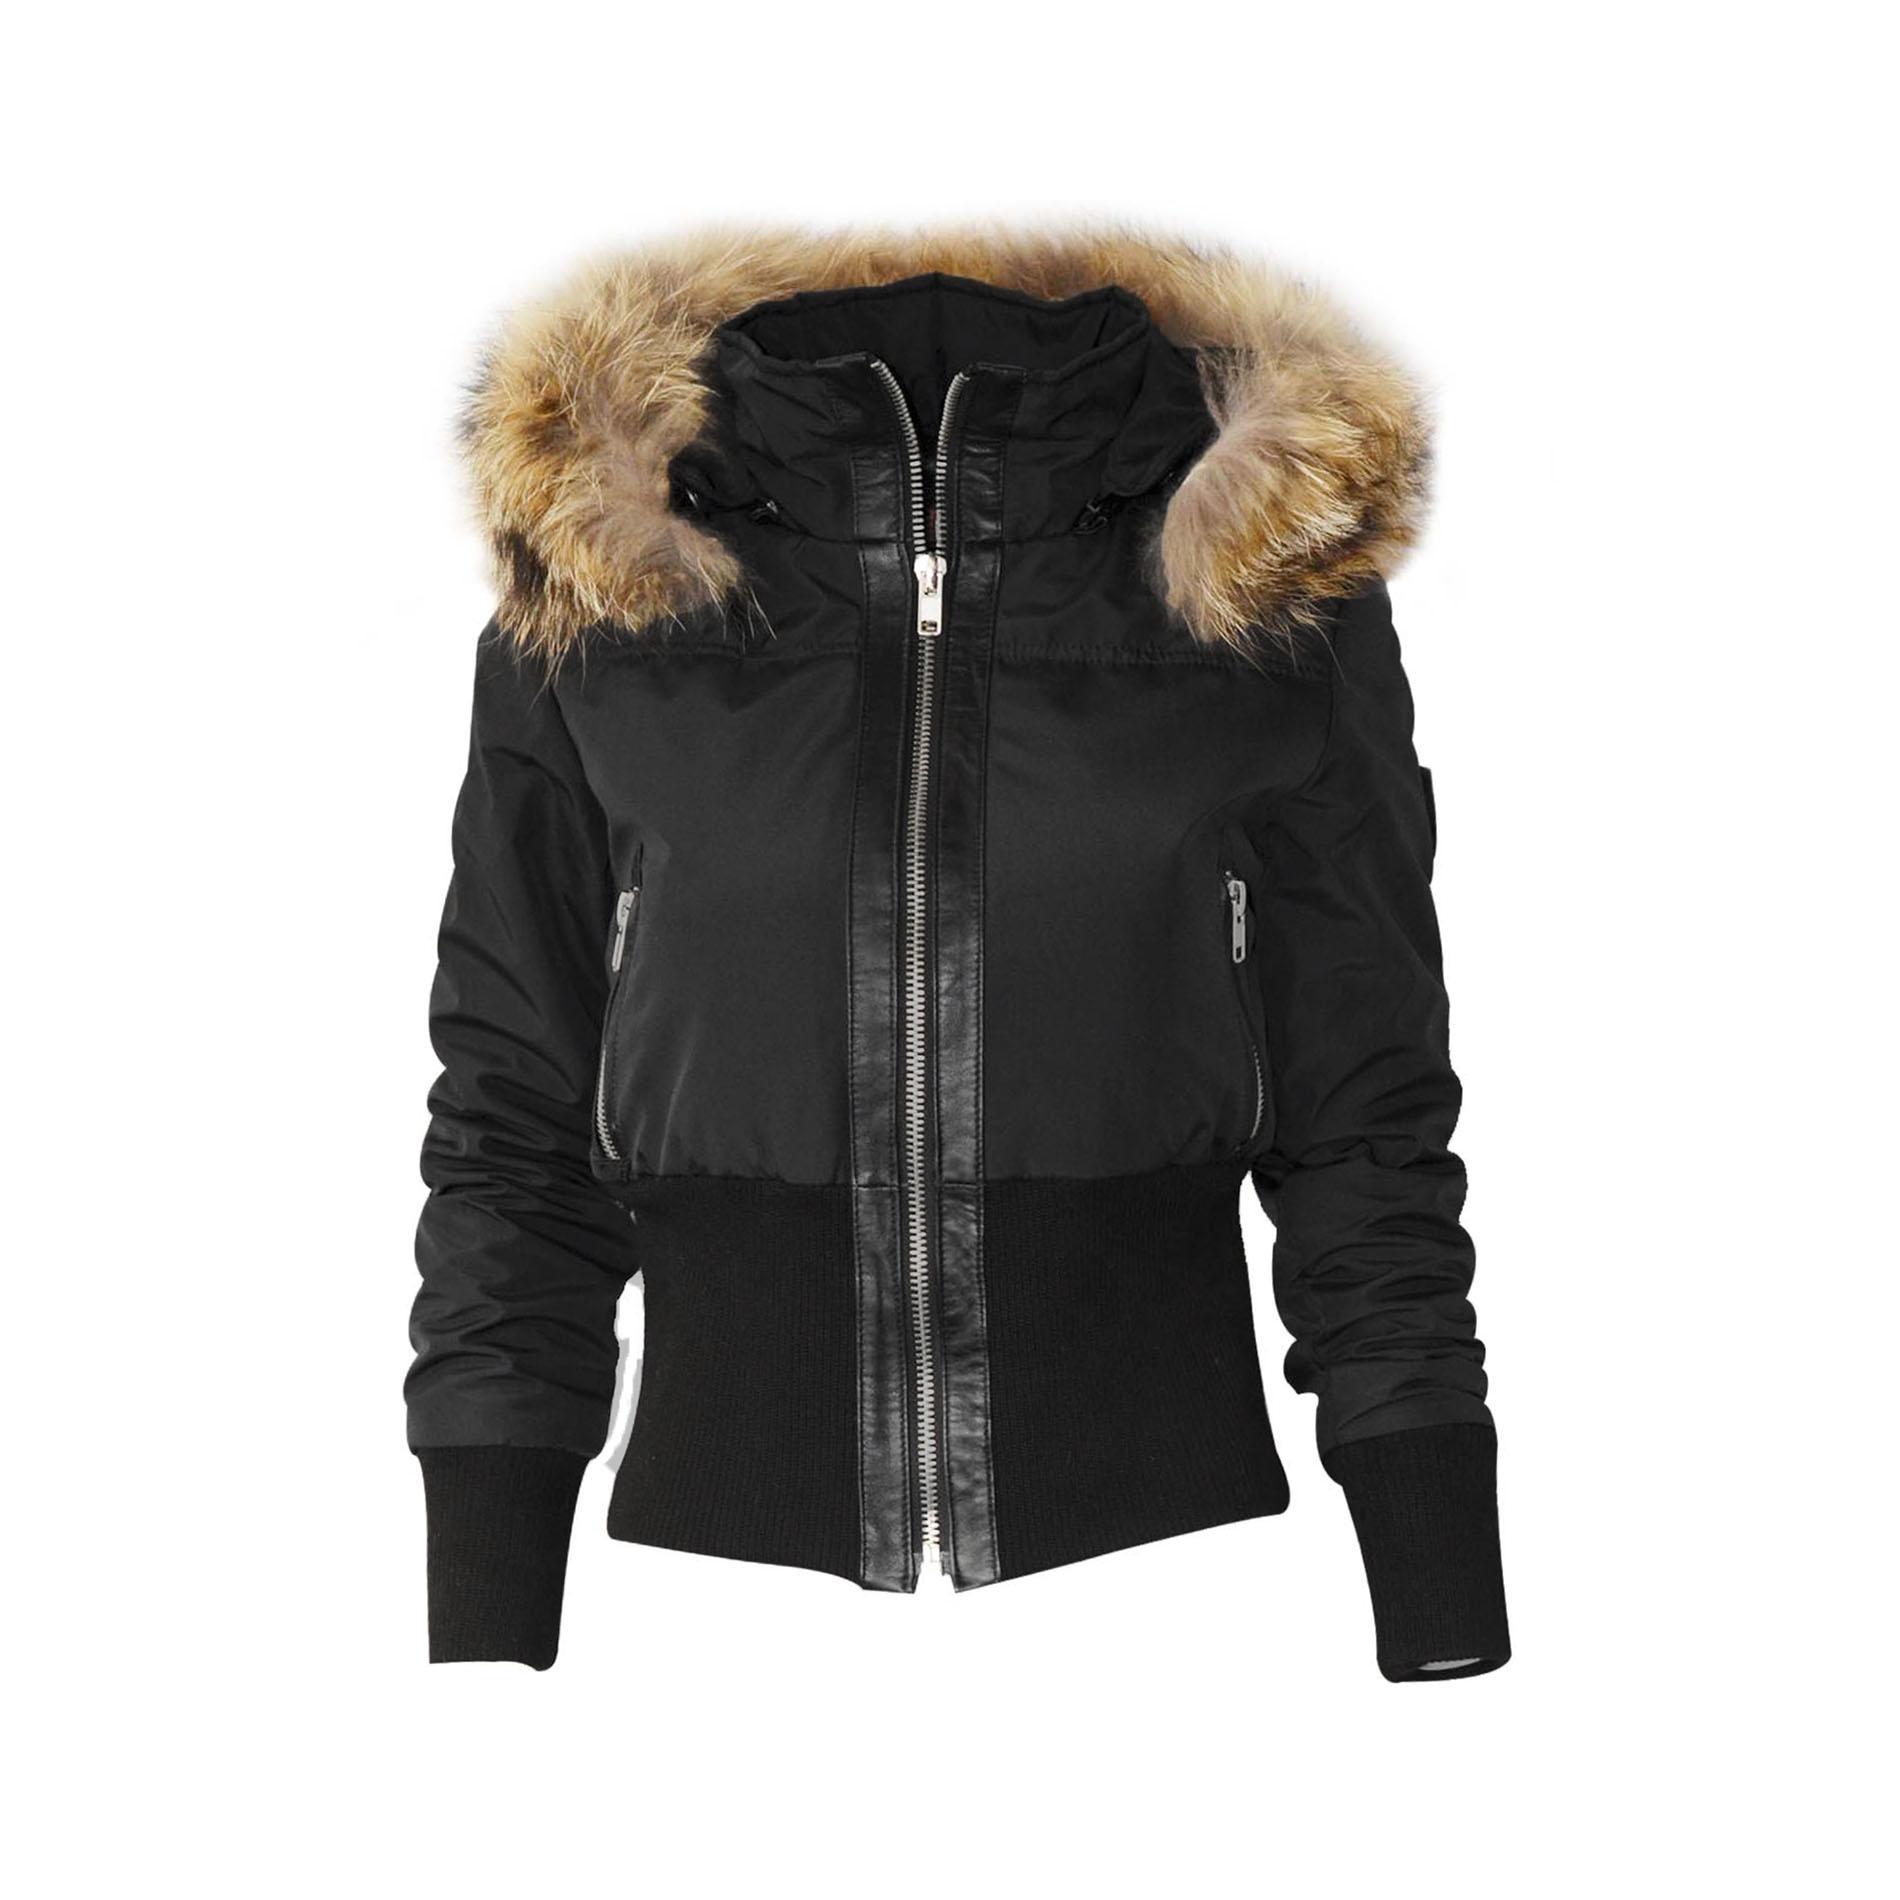 altrov veste tina doudoune hiver femme fourrure v ritable. Black Bedroom Furniture Sets. Home Design Ideas